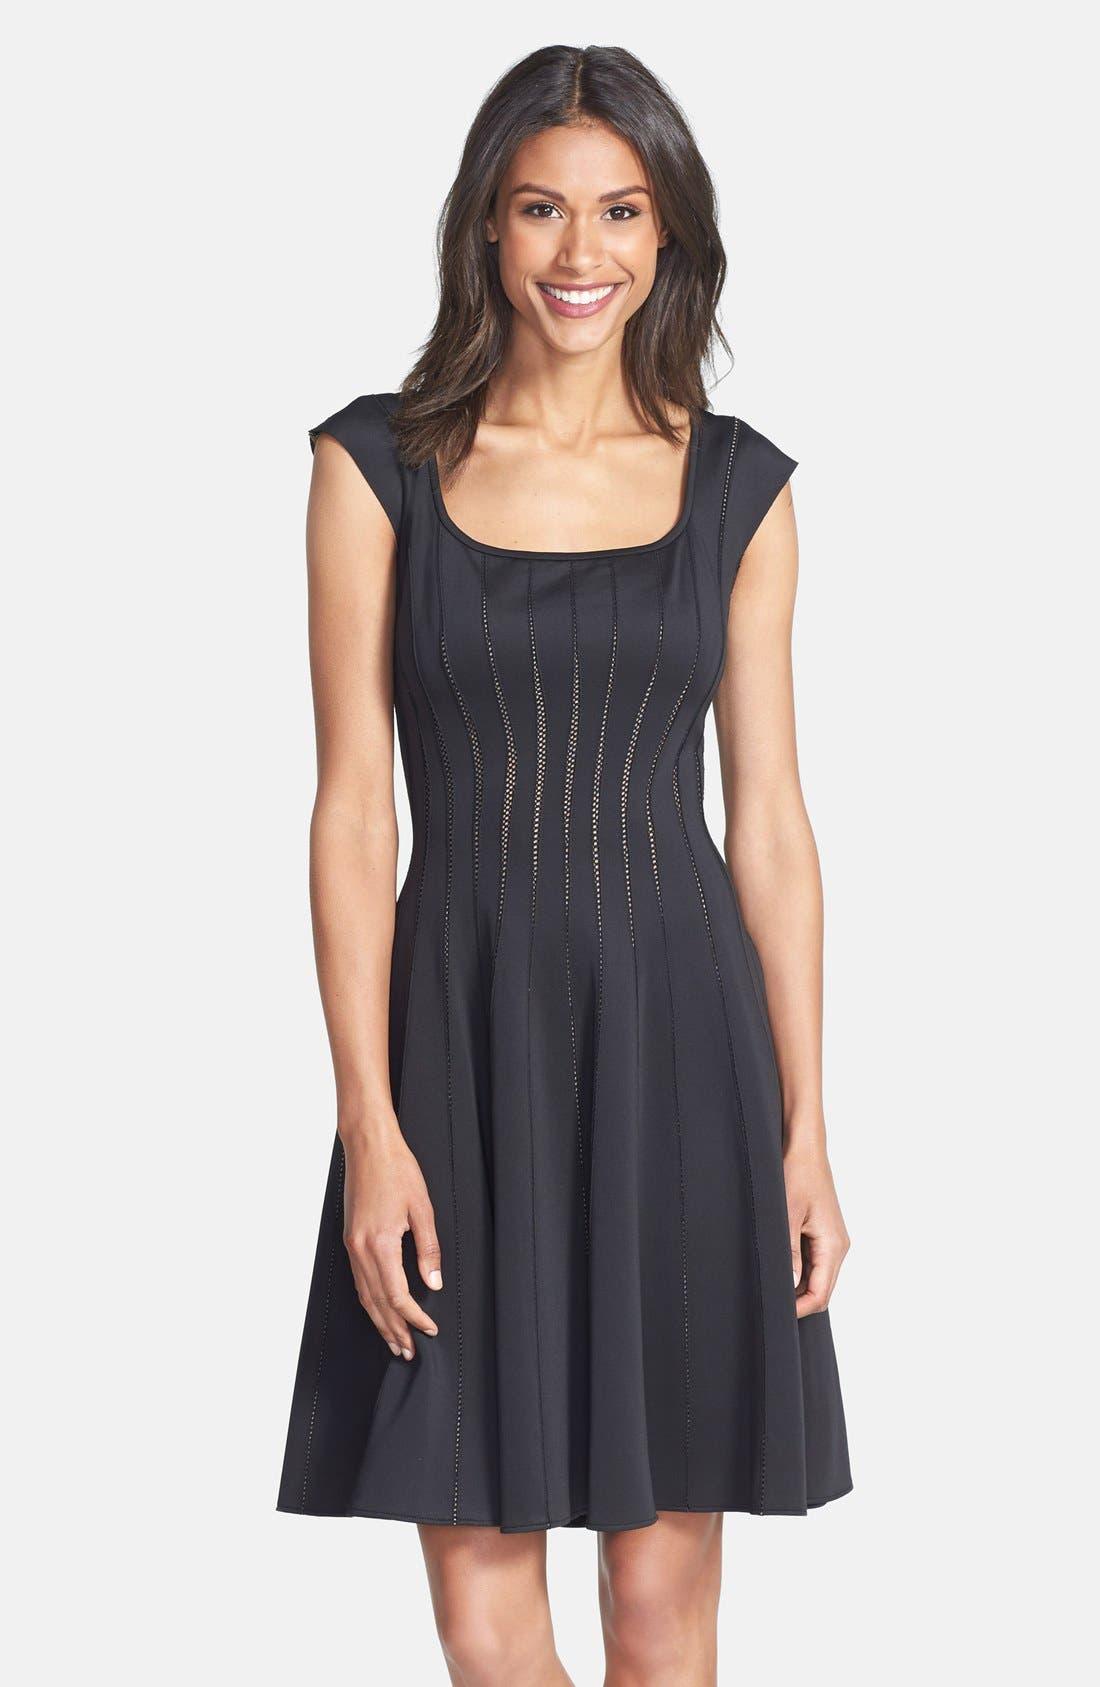 Alternate Image 1 Selected - Tadashi Shoji Mesh Detail Knit Fit & Flare Dress